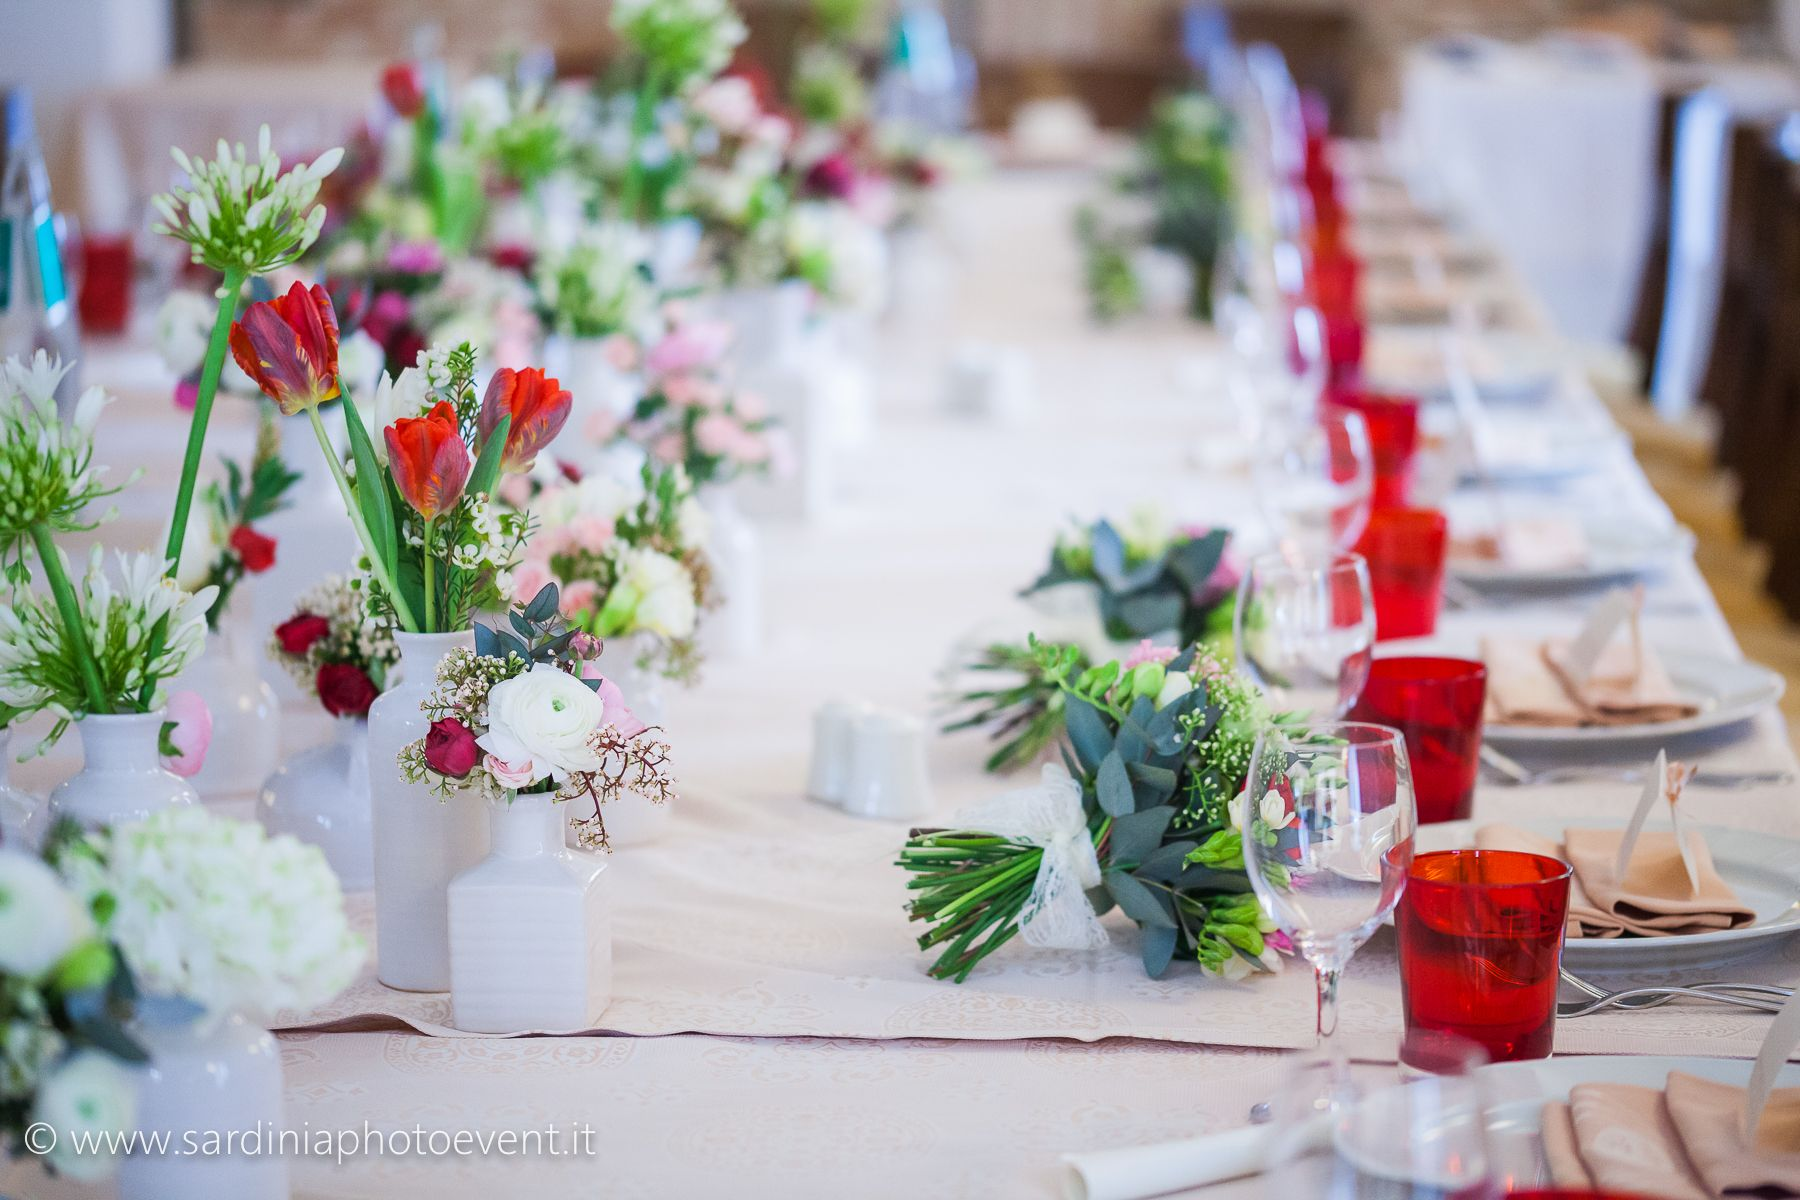 #Isposas #wedding #luxurywedding #destinationwedding #specialevents #weddingimperialtable #luxuryflowers #sardinia #love #matrimonio #welovewhatwedo #sardiniaphotoevent #weddingphotography #bouquet #weddingflowers #macaron #confetti #papadolceamaro #professionalitàepassione #partyfavors #bomboniere #sumarmuri #ogliastra #bride #groom #arbatasar